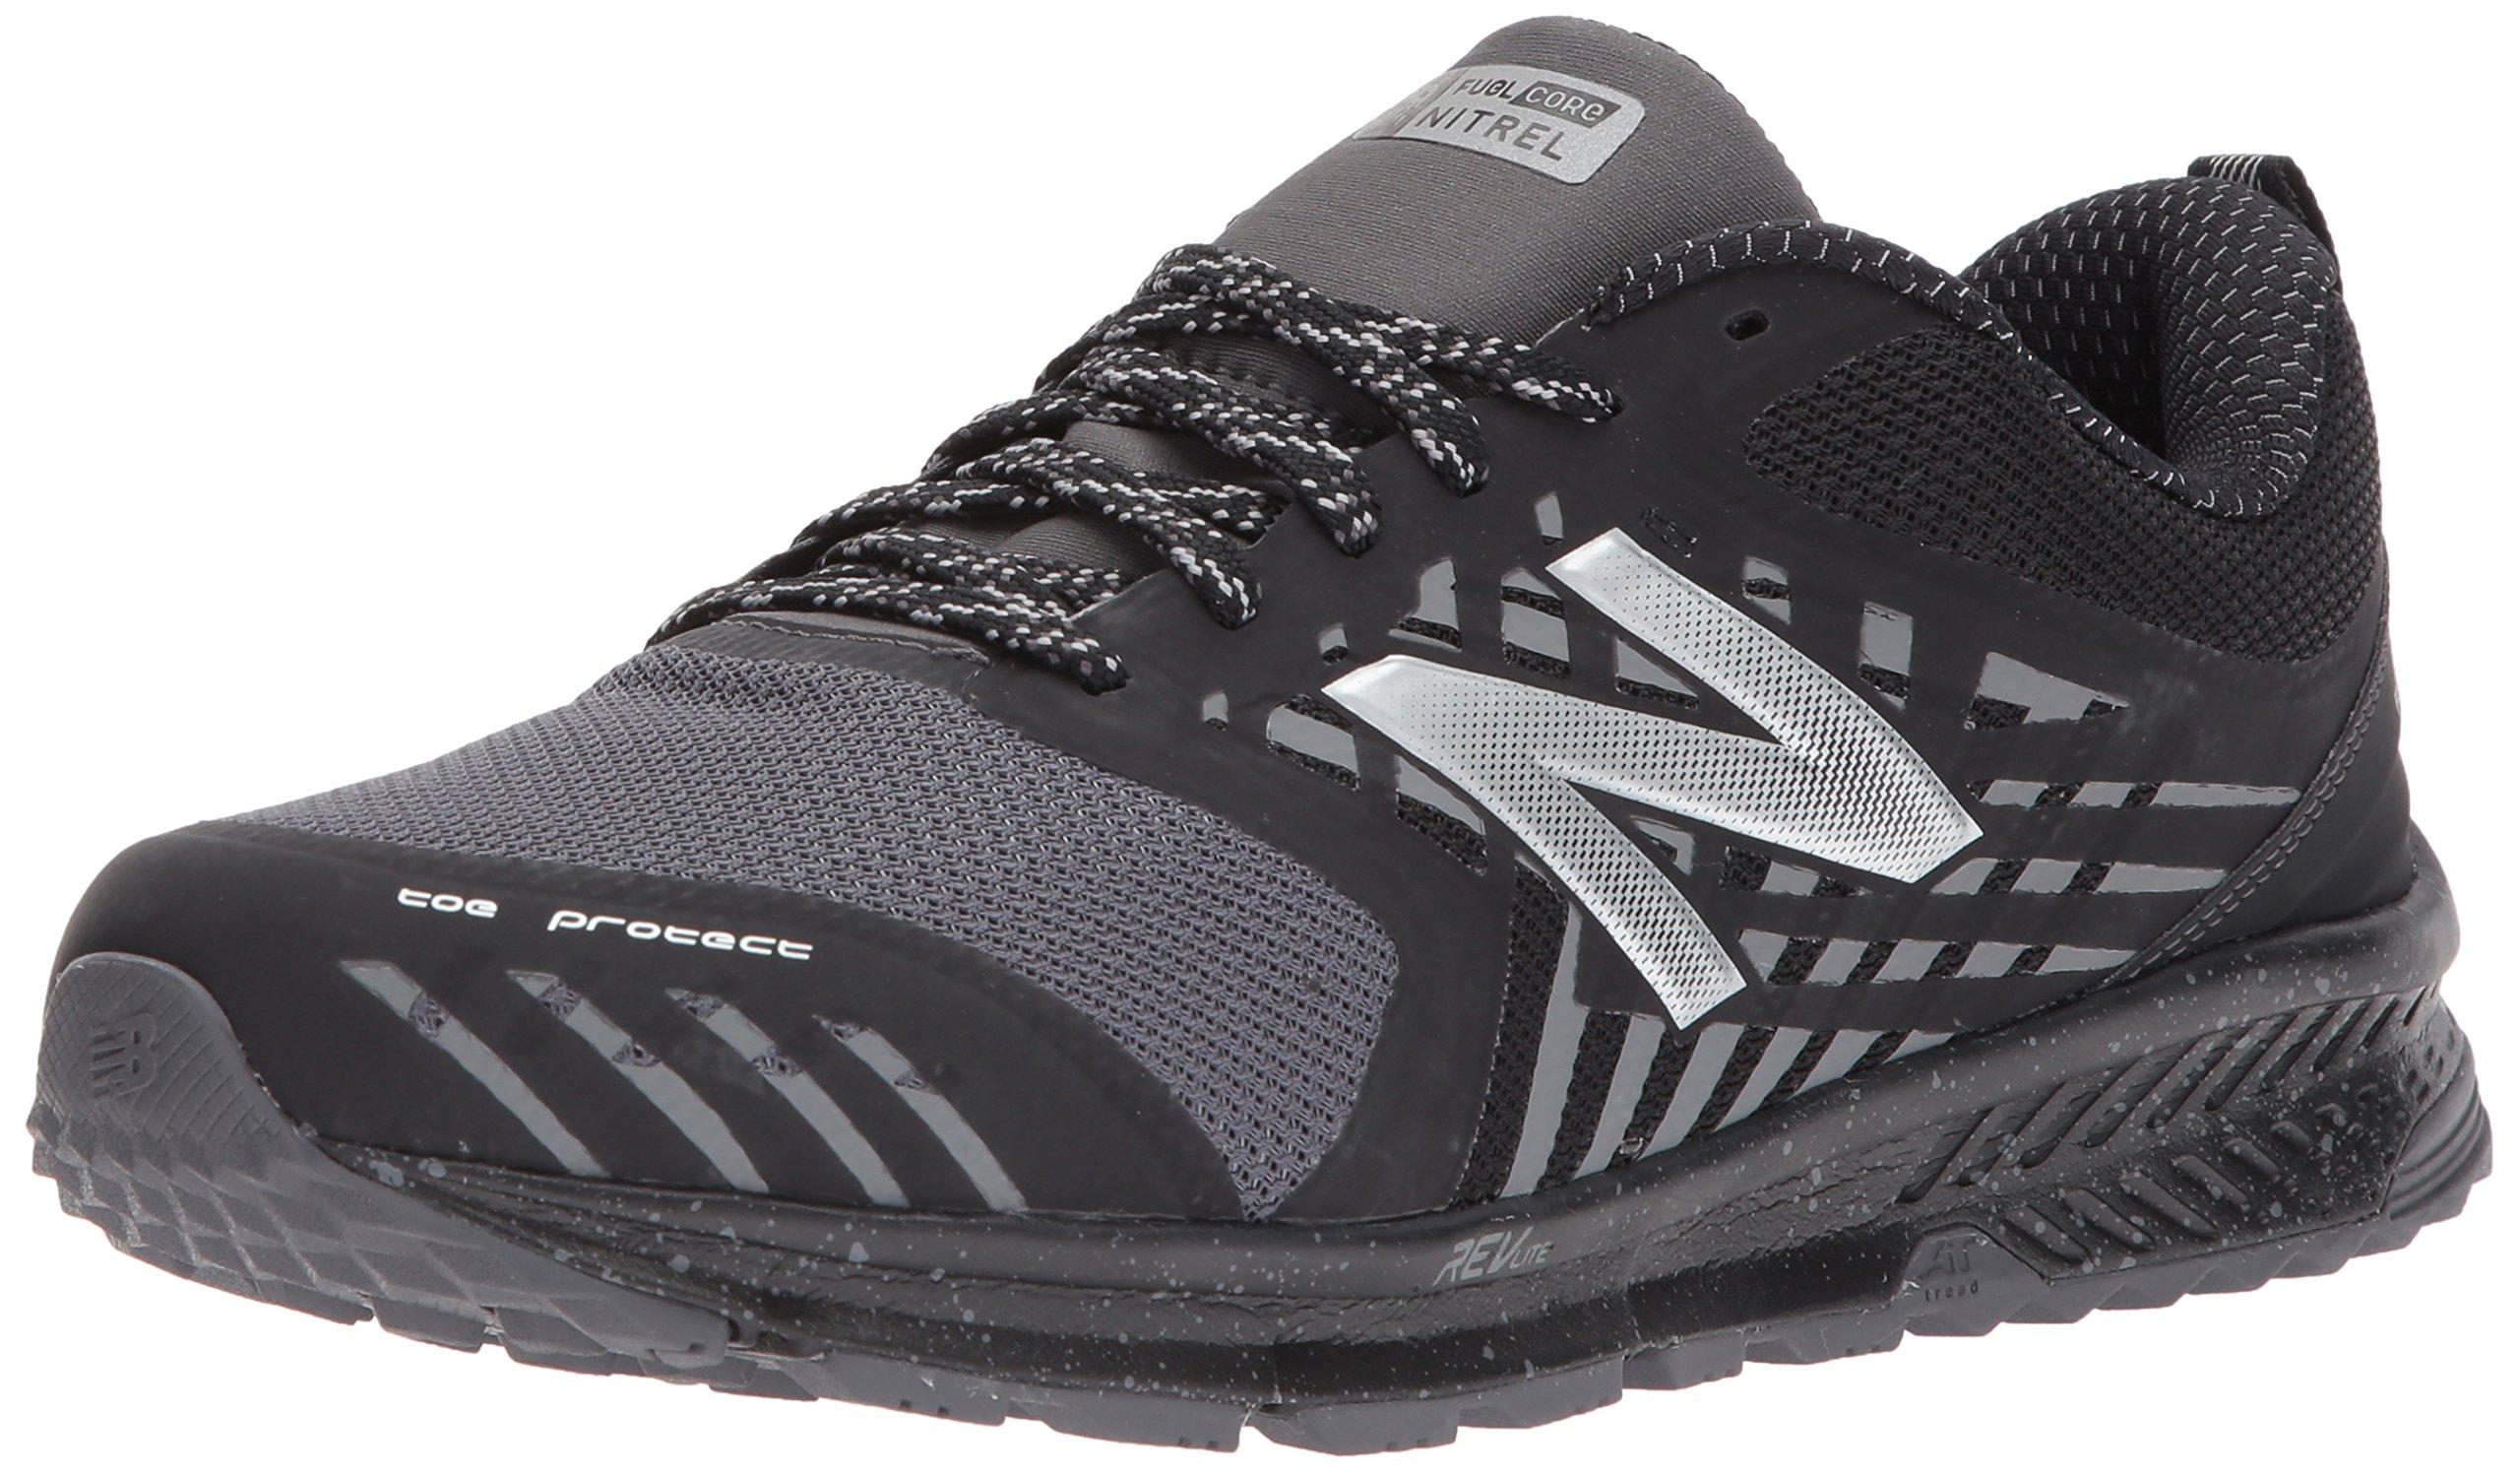 New Balance Men's Nitrel v1 FuelCore Trail Running Shoe, Black/Grey, 13 D US by New Balance